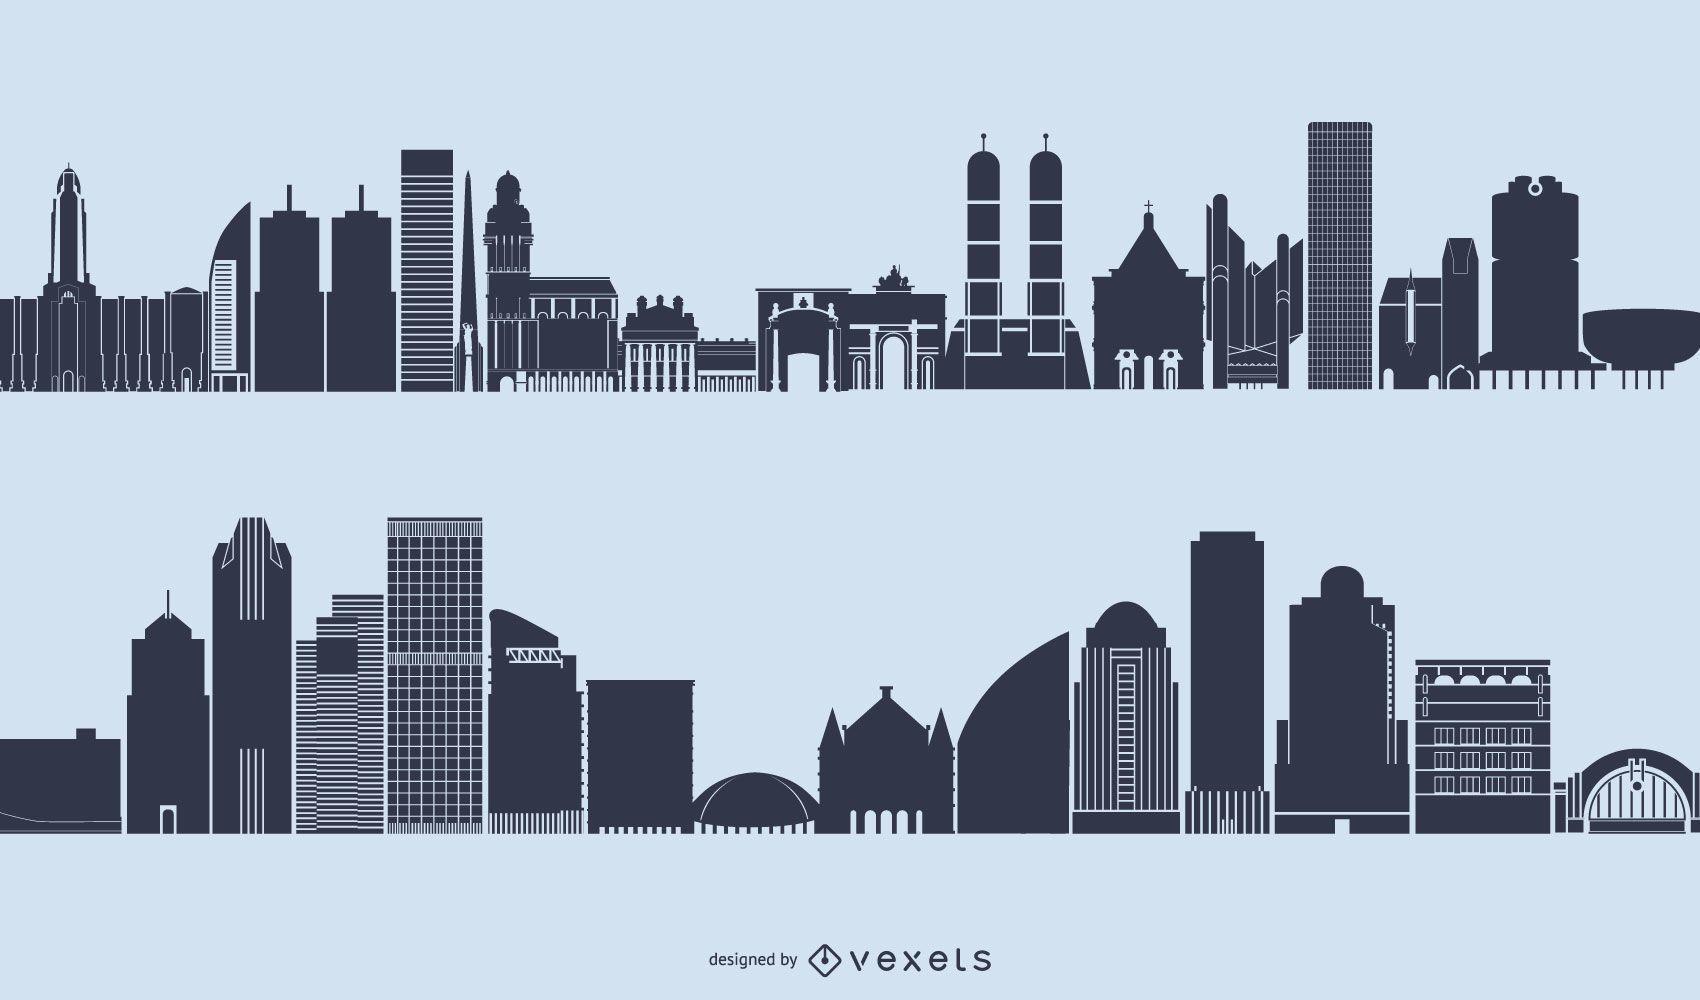 Generic Skyline Cityscape Silhouette Vector